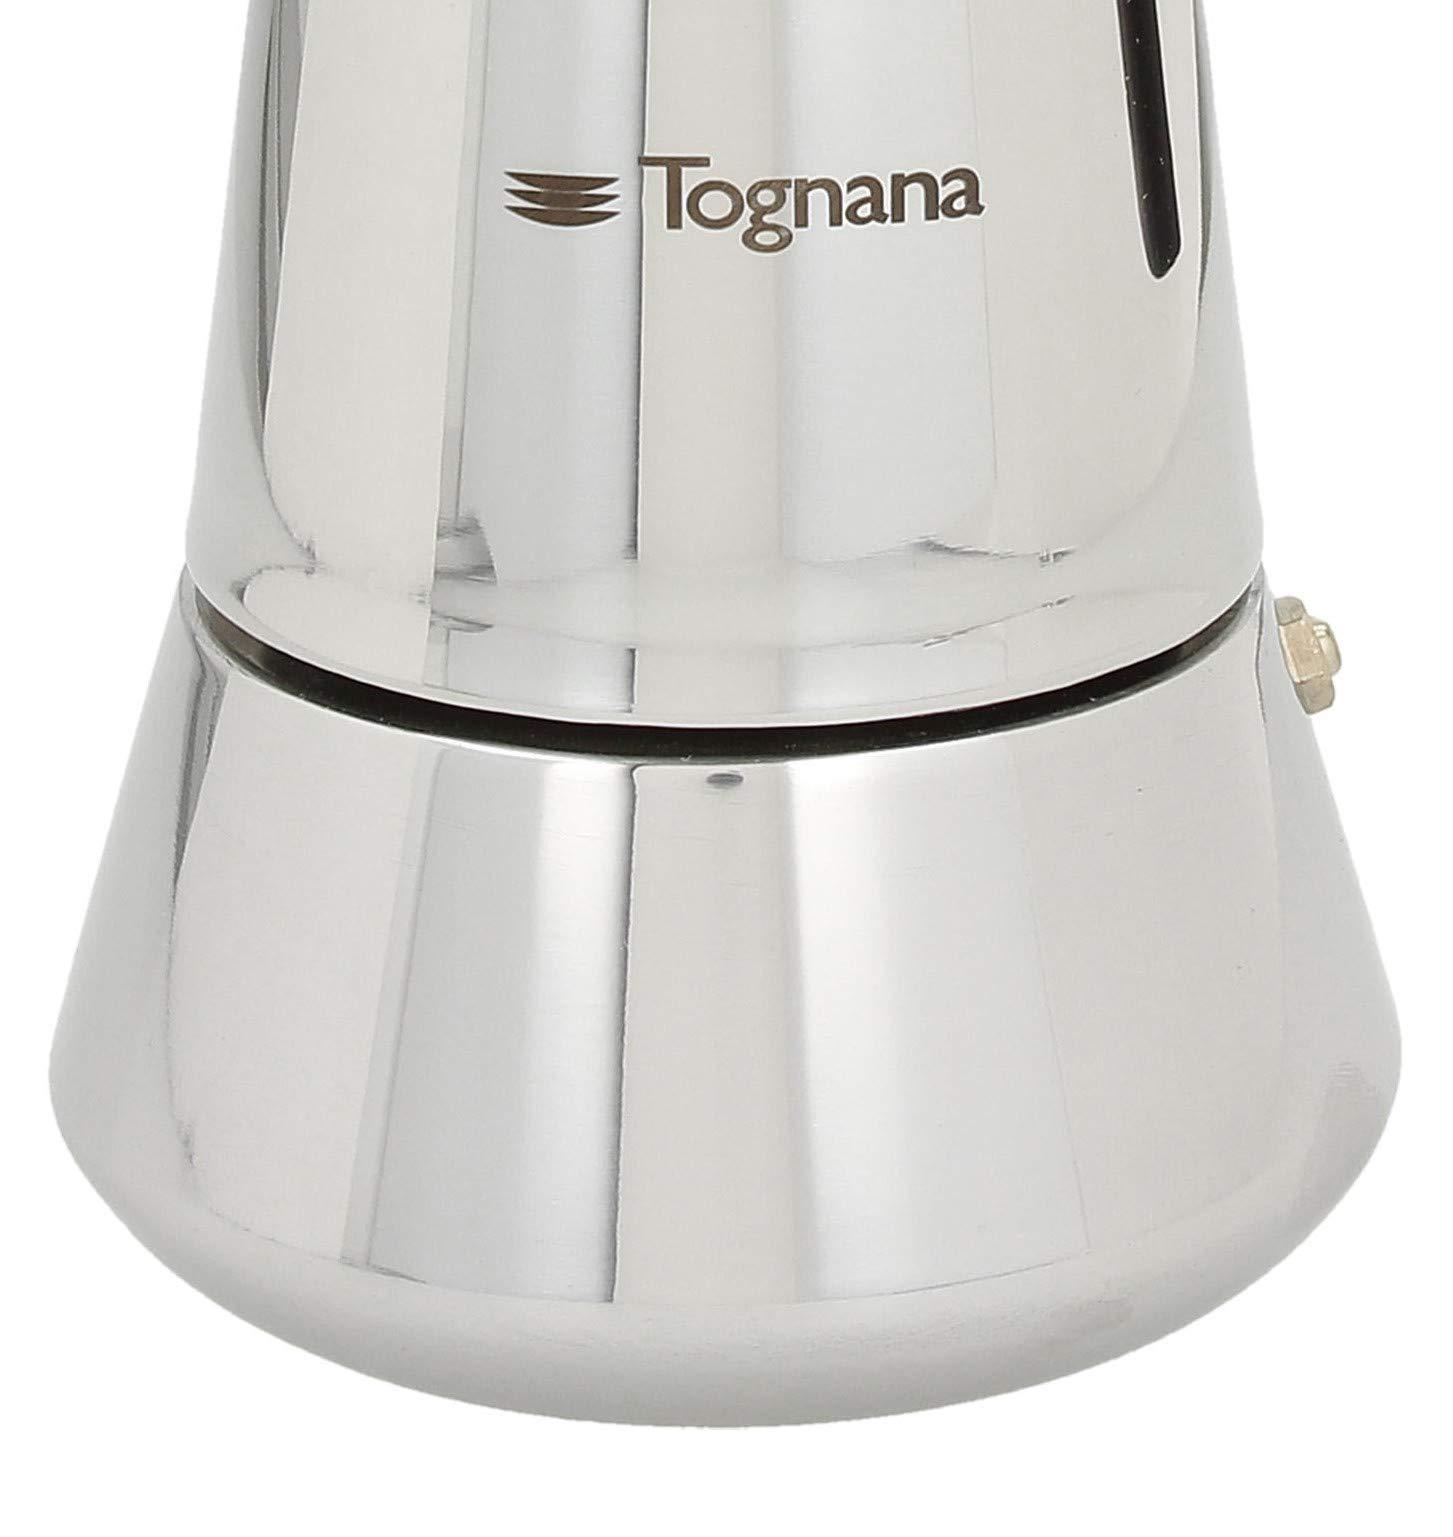 Tognana Riflex Induction Caffettiera 4 Tazze, Acciaio Inossidabile, Argento 5 spesavip